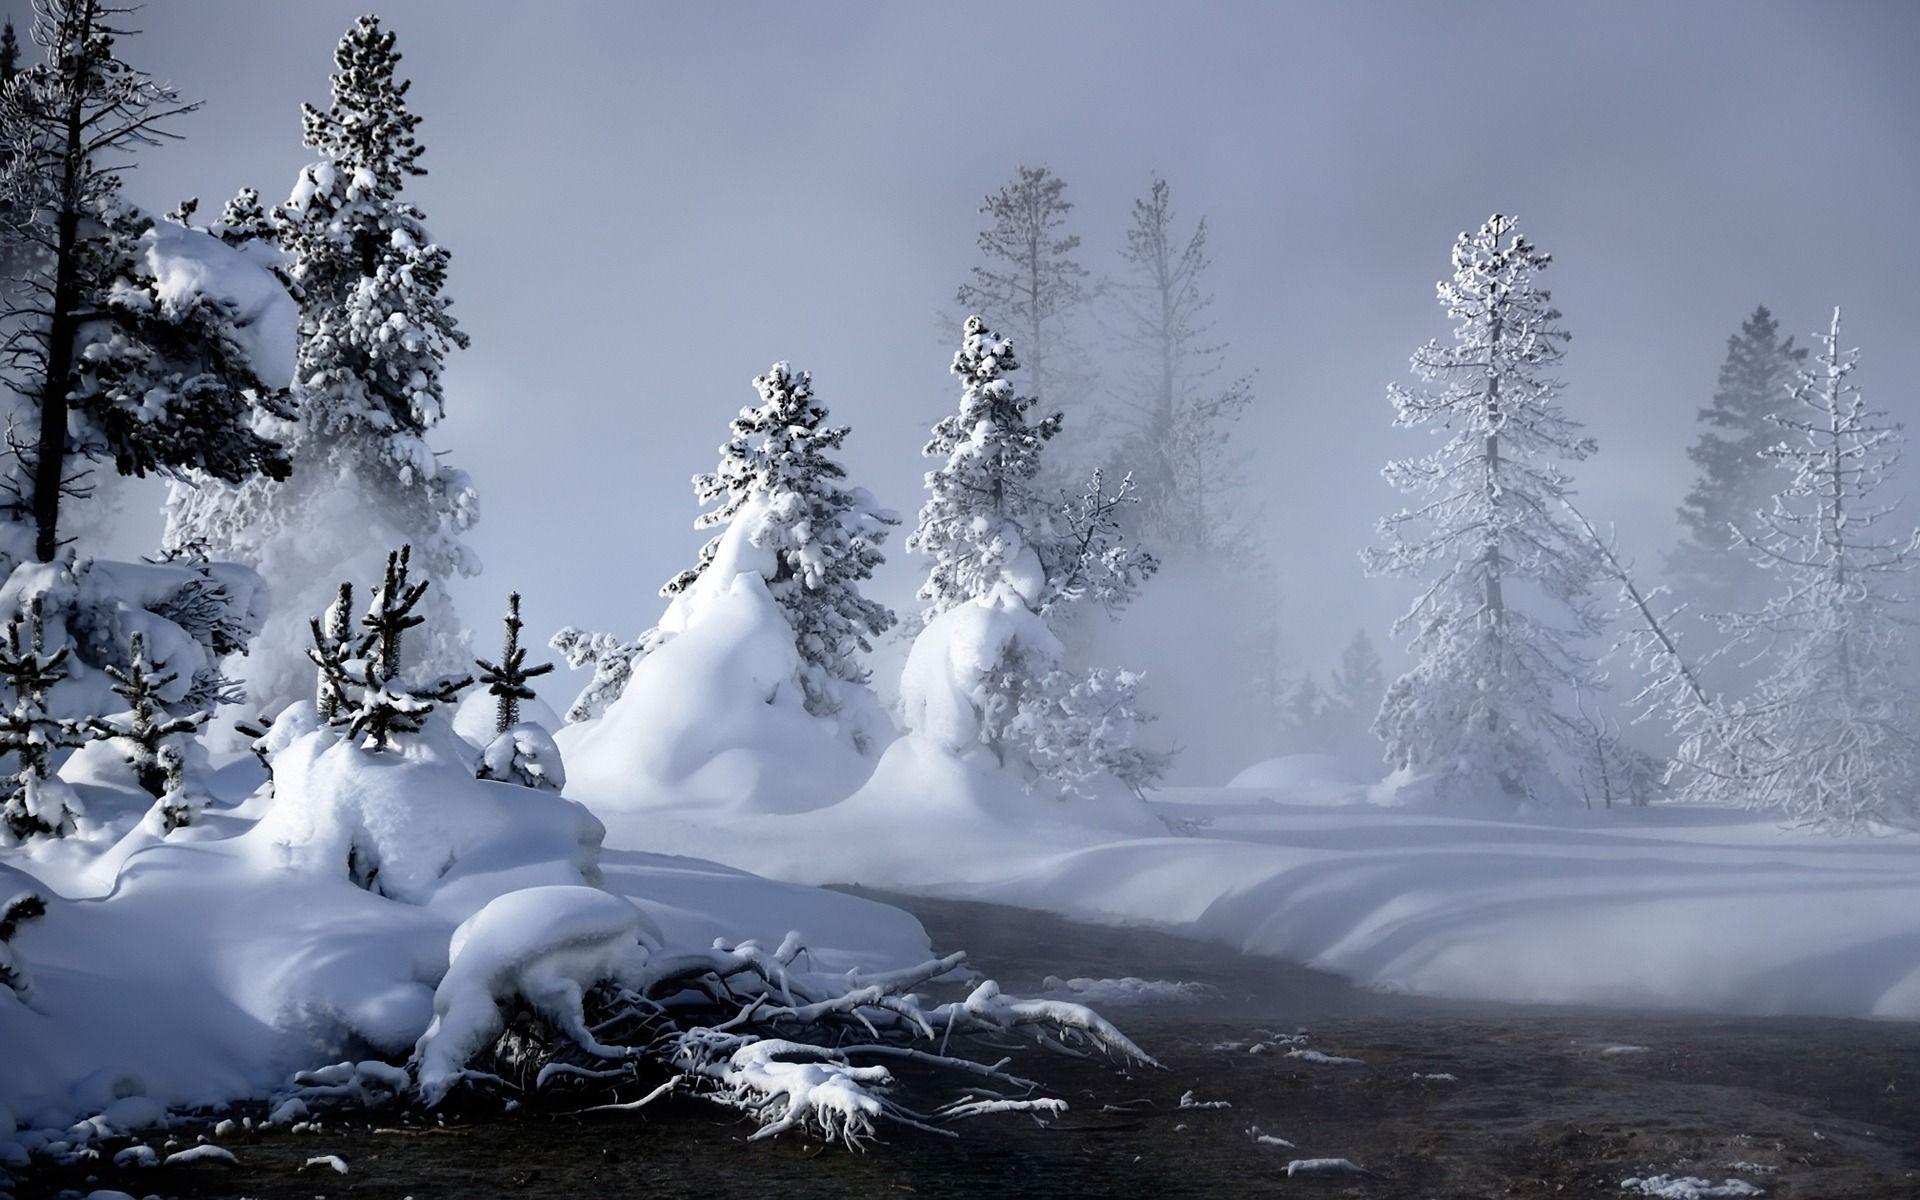 Mystic Winter Trees Wallpaper Hd Wallpaper Iphone